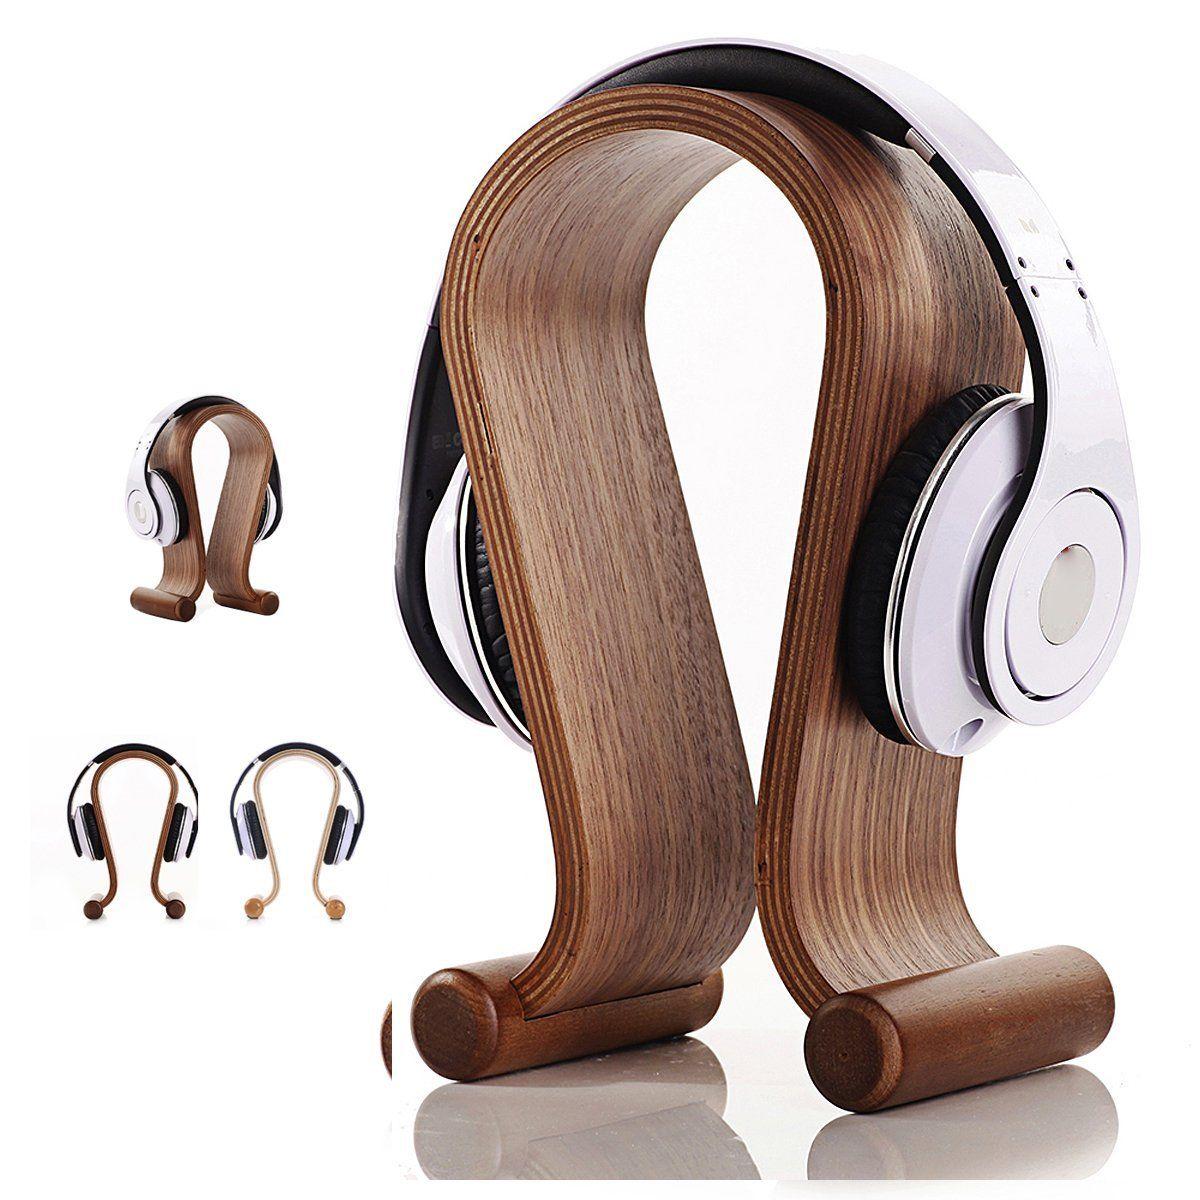 Samdi Wooden Gaming Headphone Stand Holder Earphone Hanger Headset Display Rack